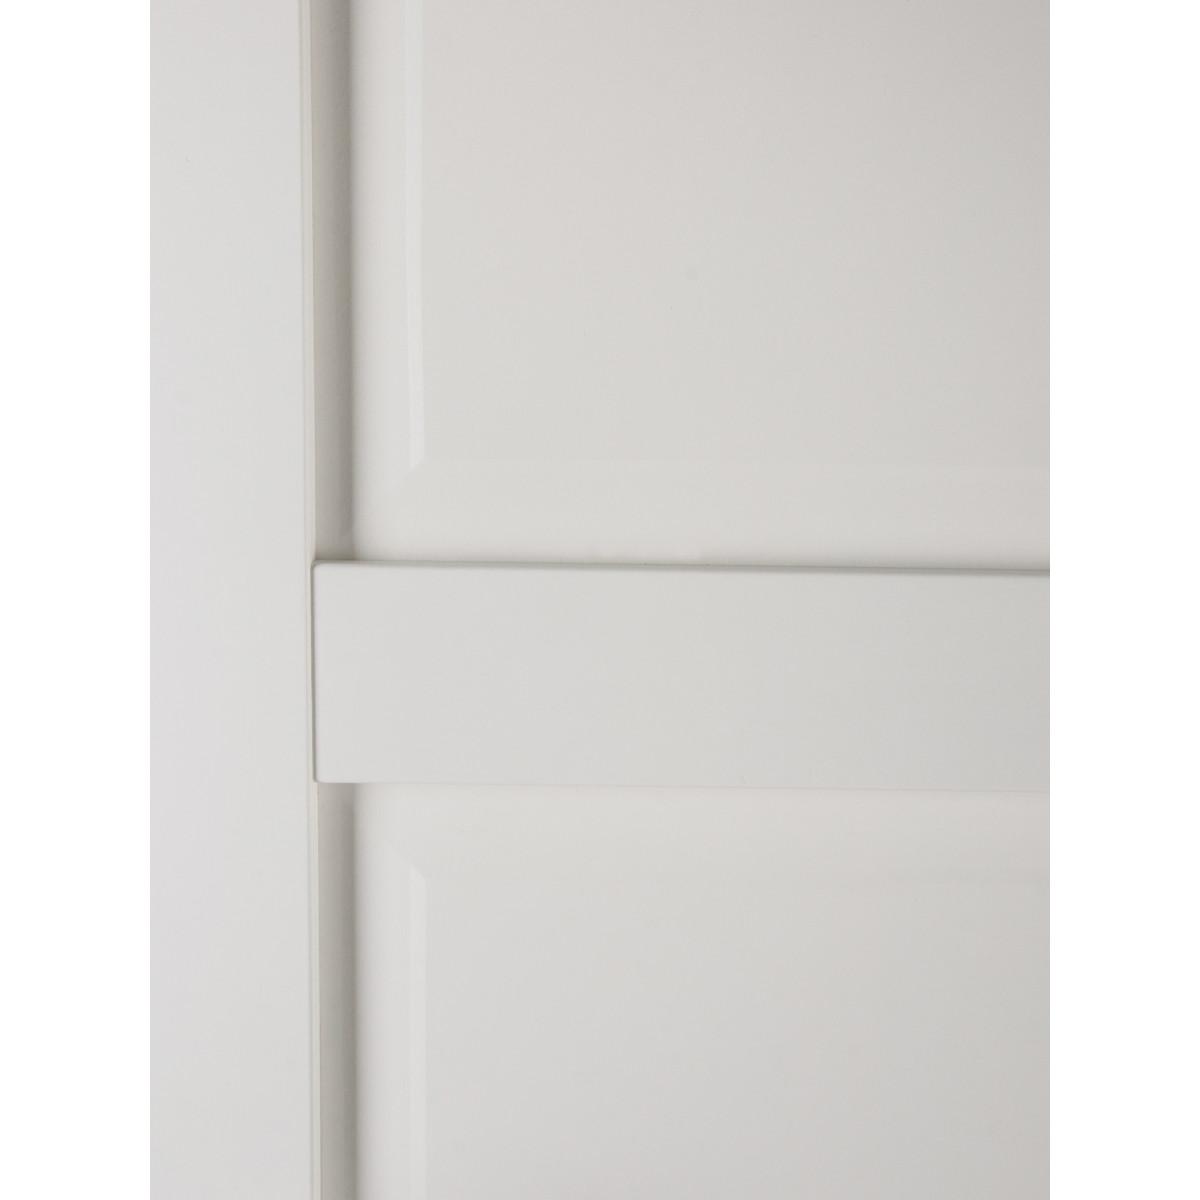 Дверь Межкомнатная С Фурнитурой Адажио 90Х200 Hardflex Цвет Белый